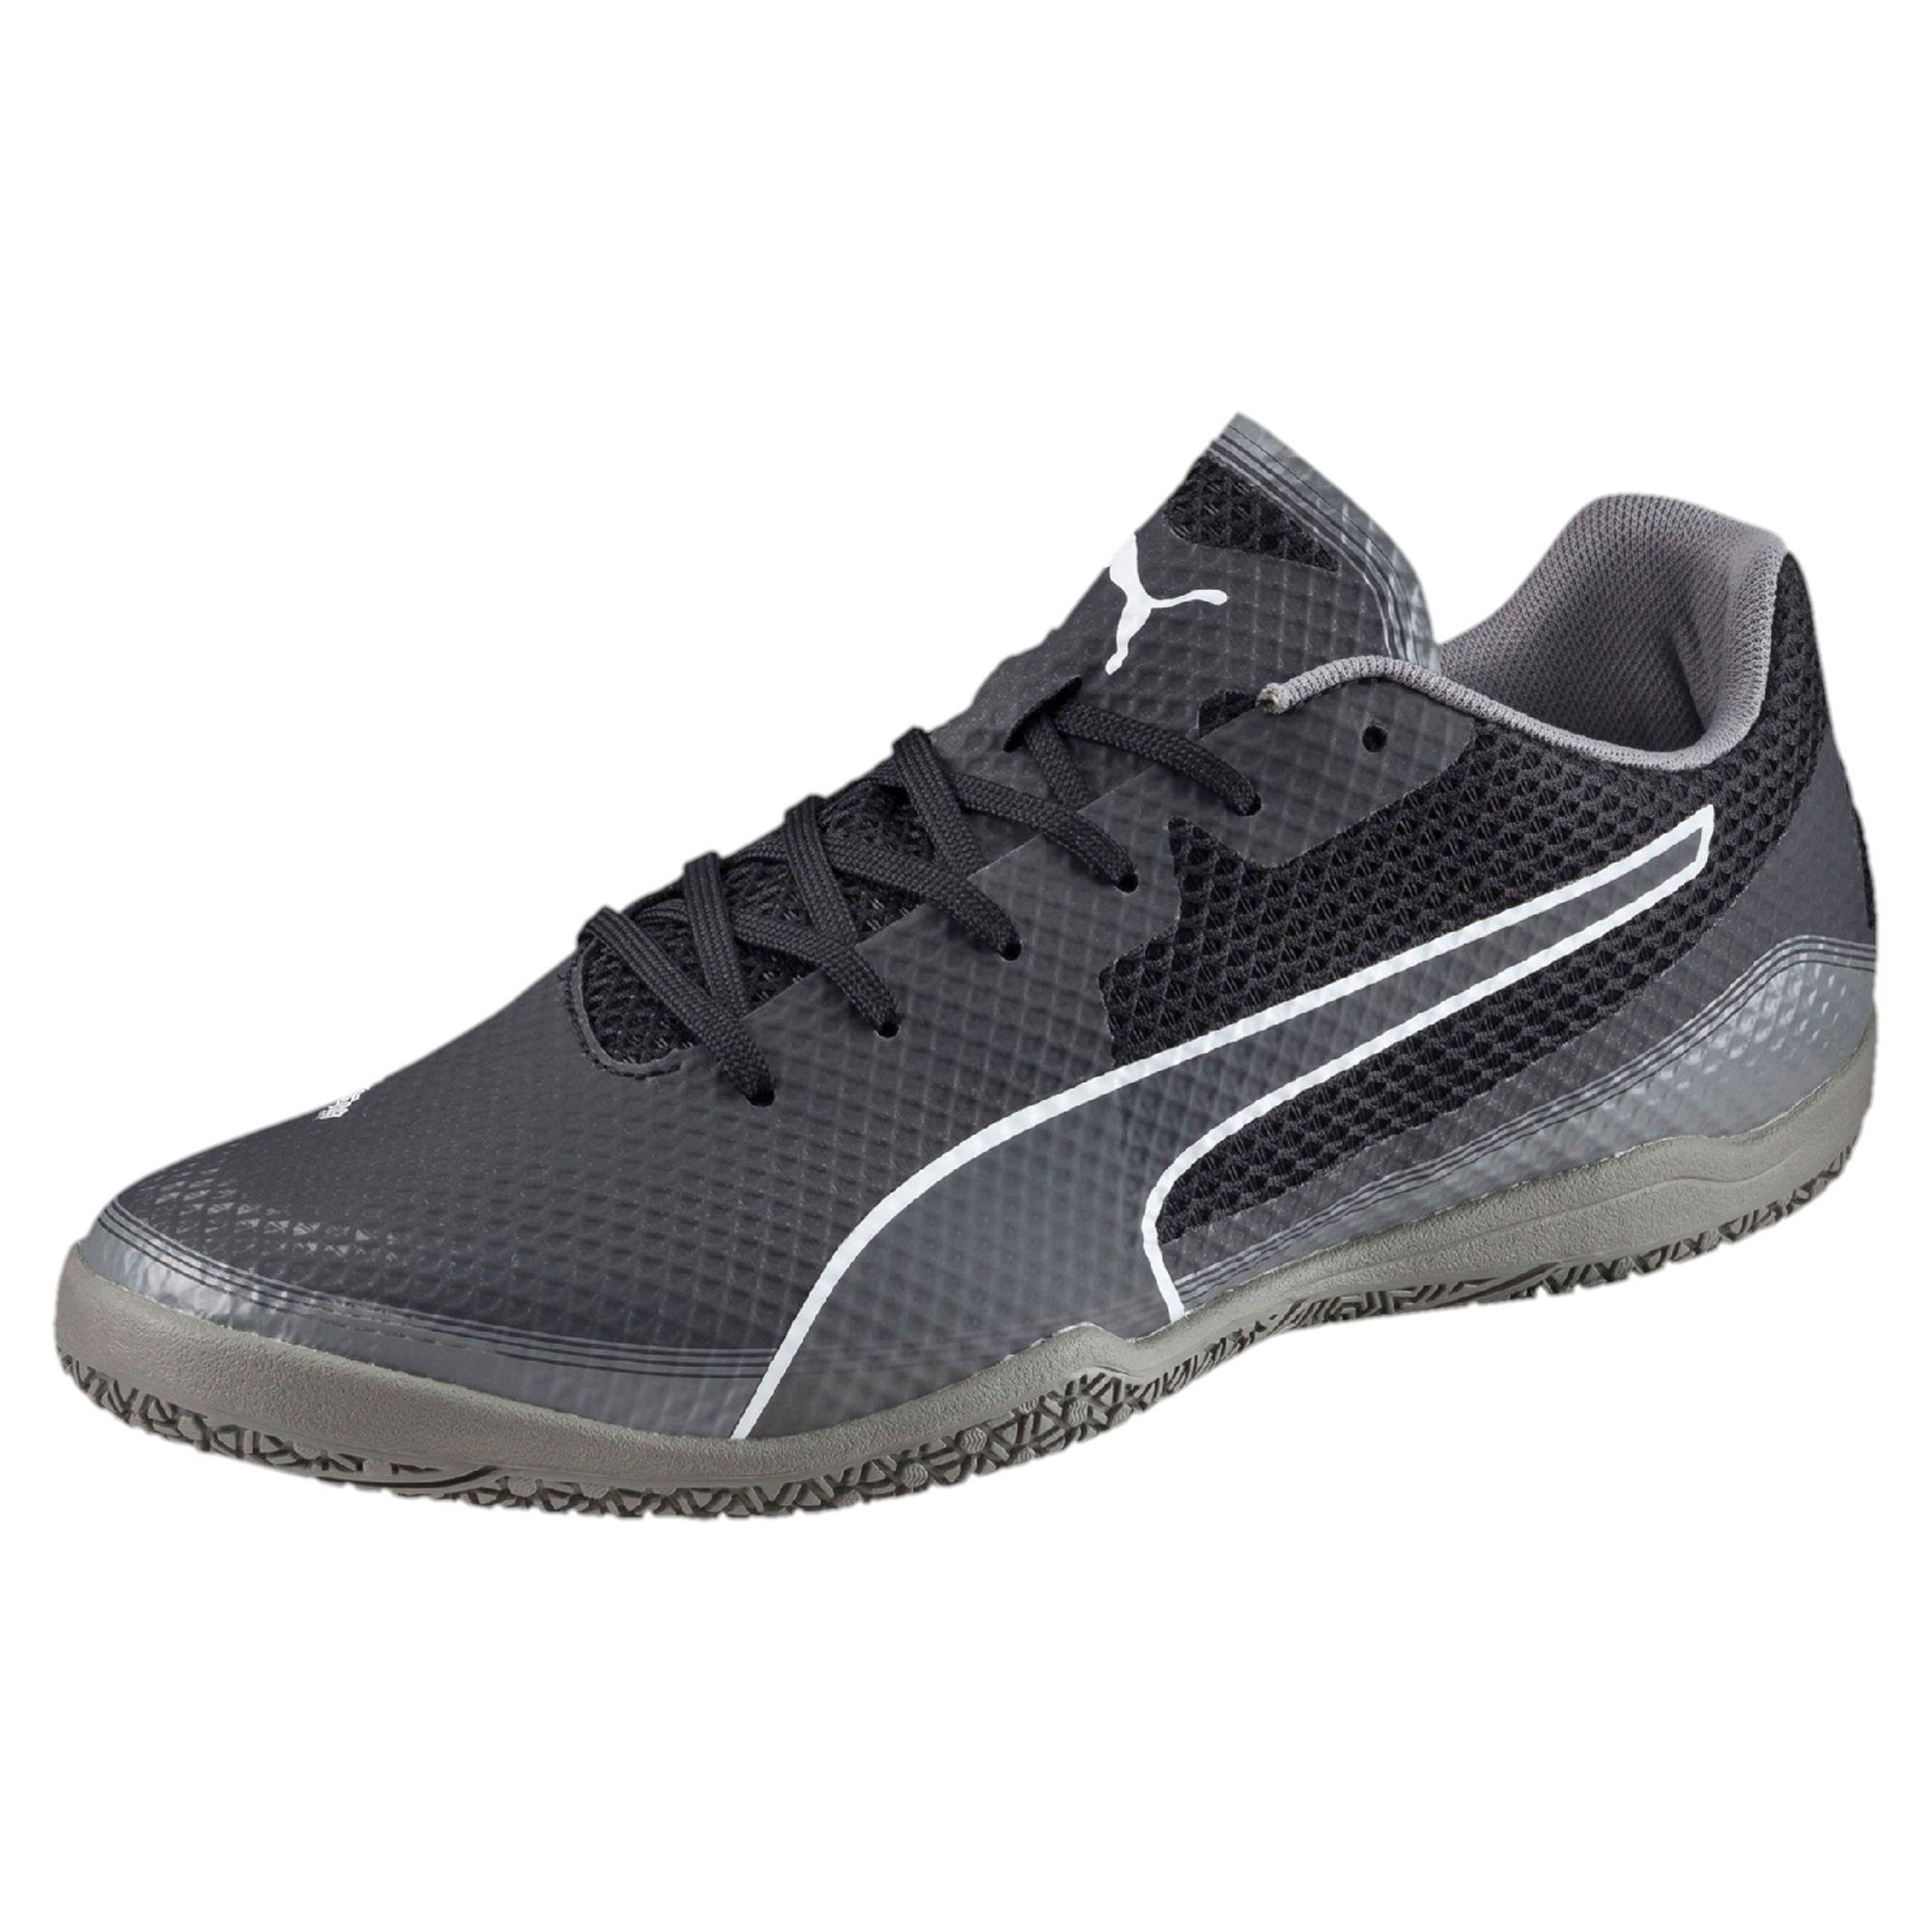 cd1dd2f32144 Lyst - Puma Invicto Fresh Men s Indoor Soccer Shoes in Gray for Men